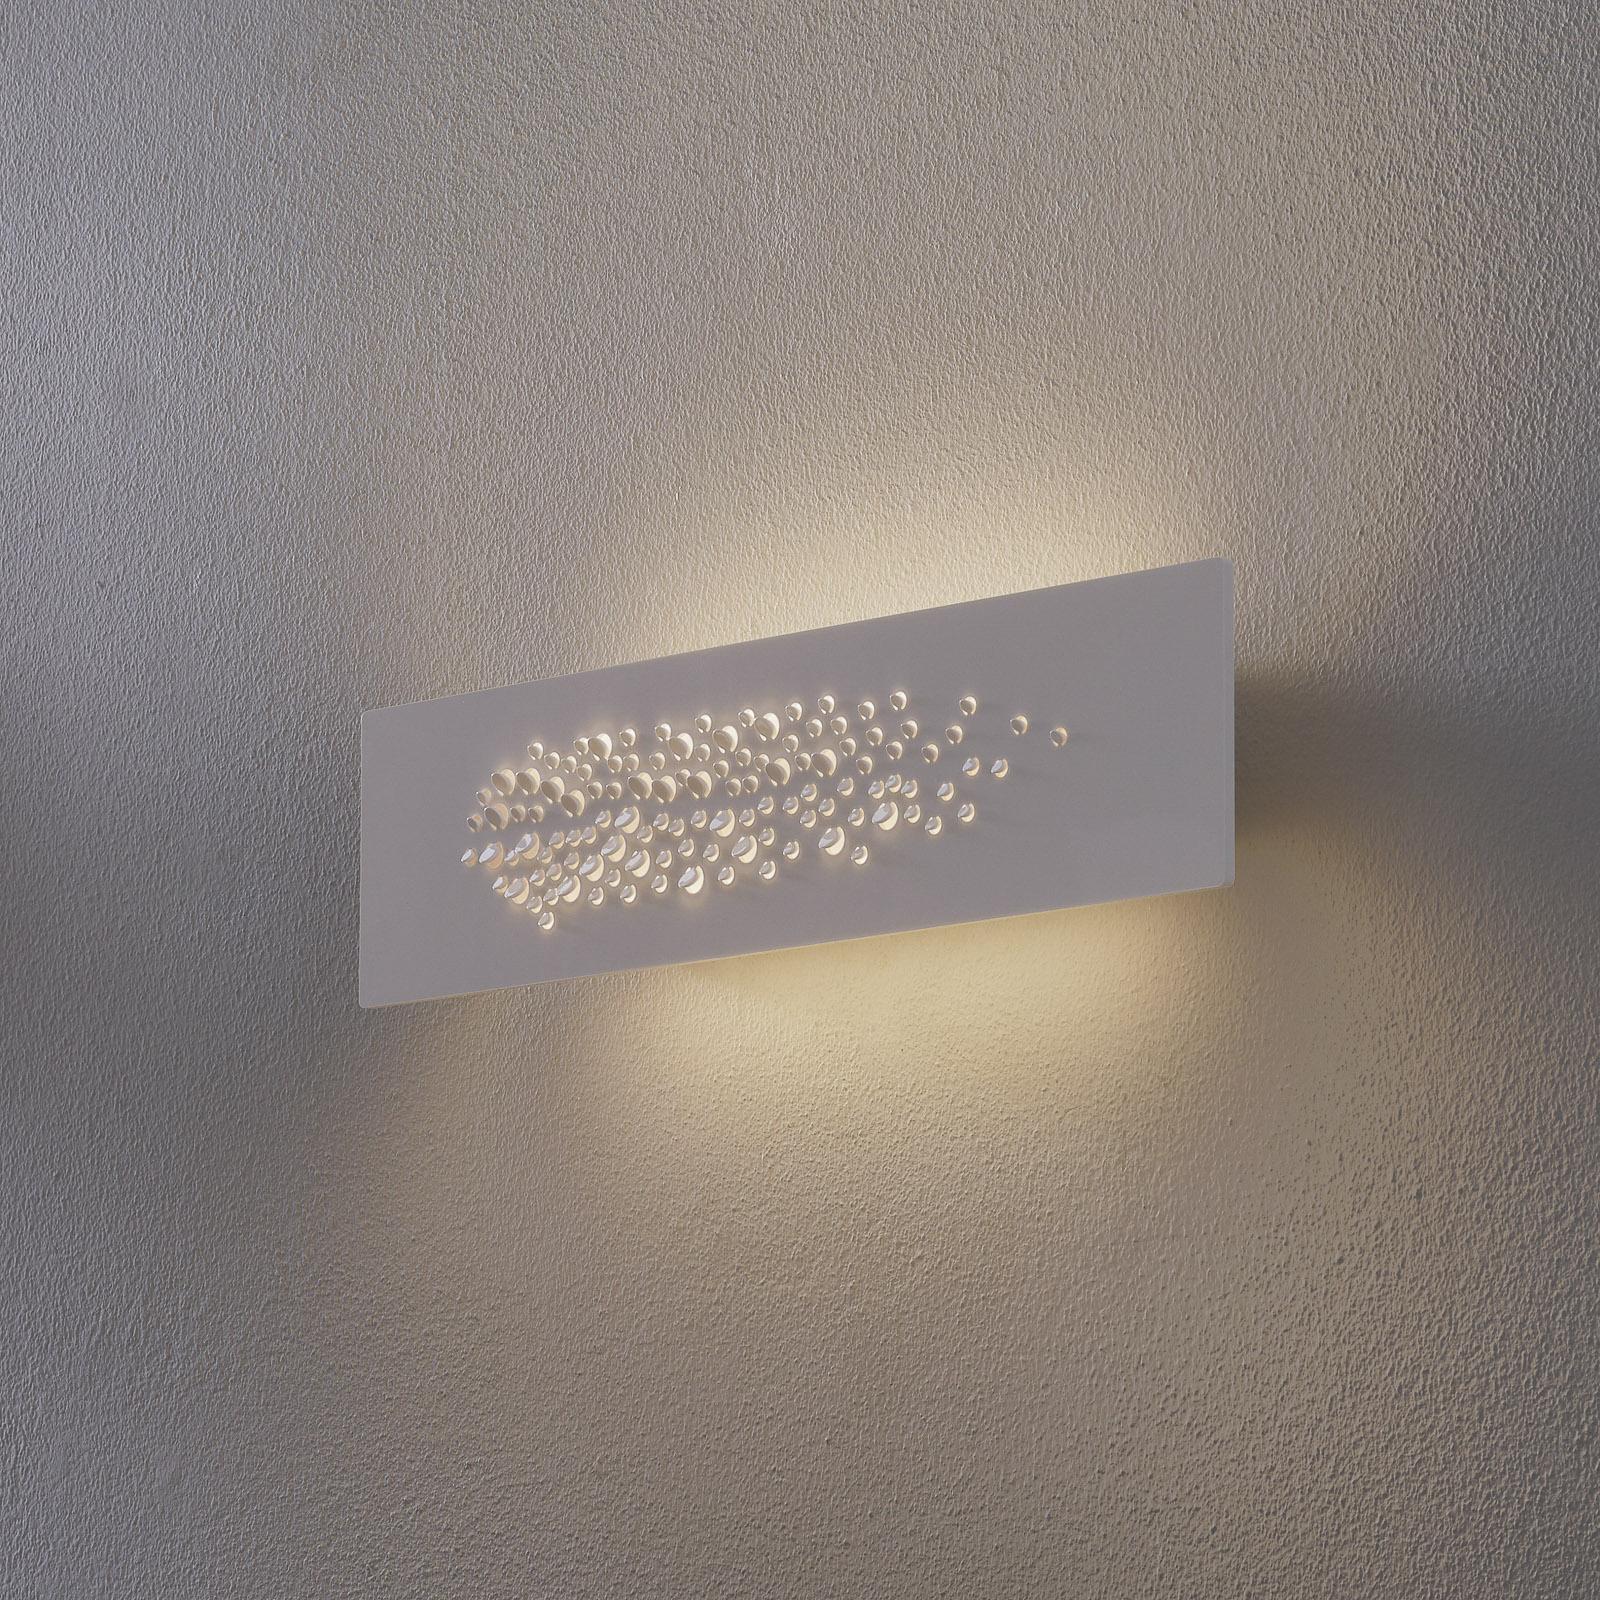 Aplique de diseño Islet con LEDs